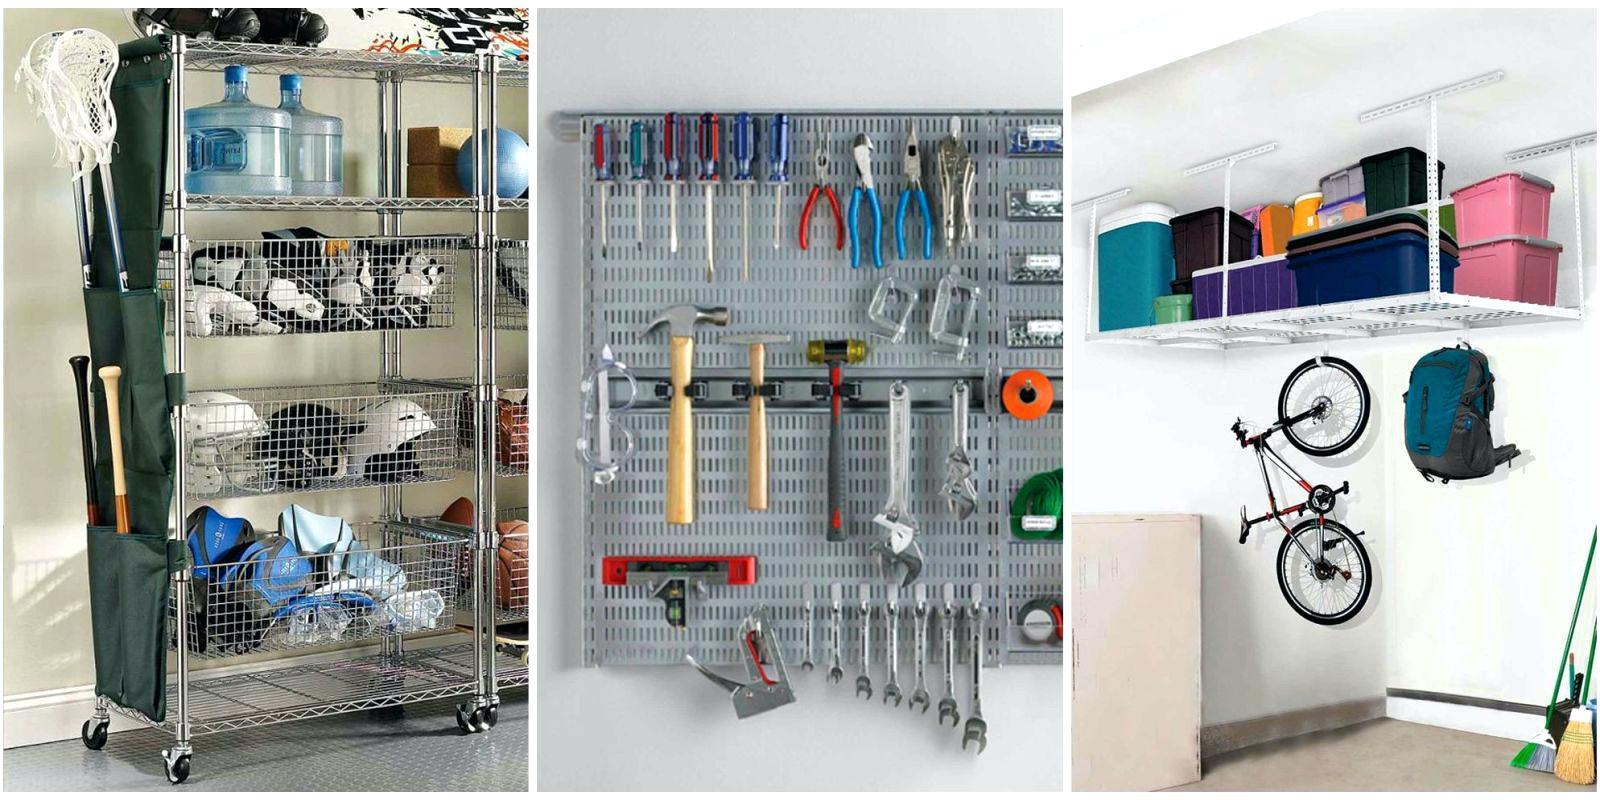 Garage Organizations Ideas for Garage Organization Ideas for Garage Organization Ideas for Garage Organization Bikes BQMFIEJ